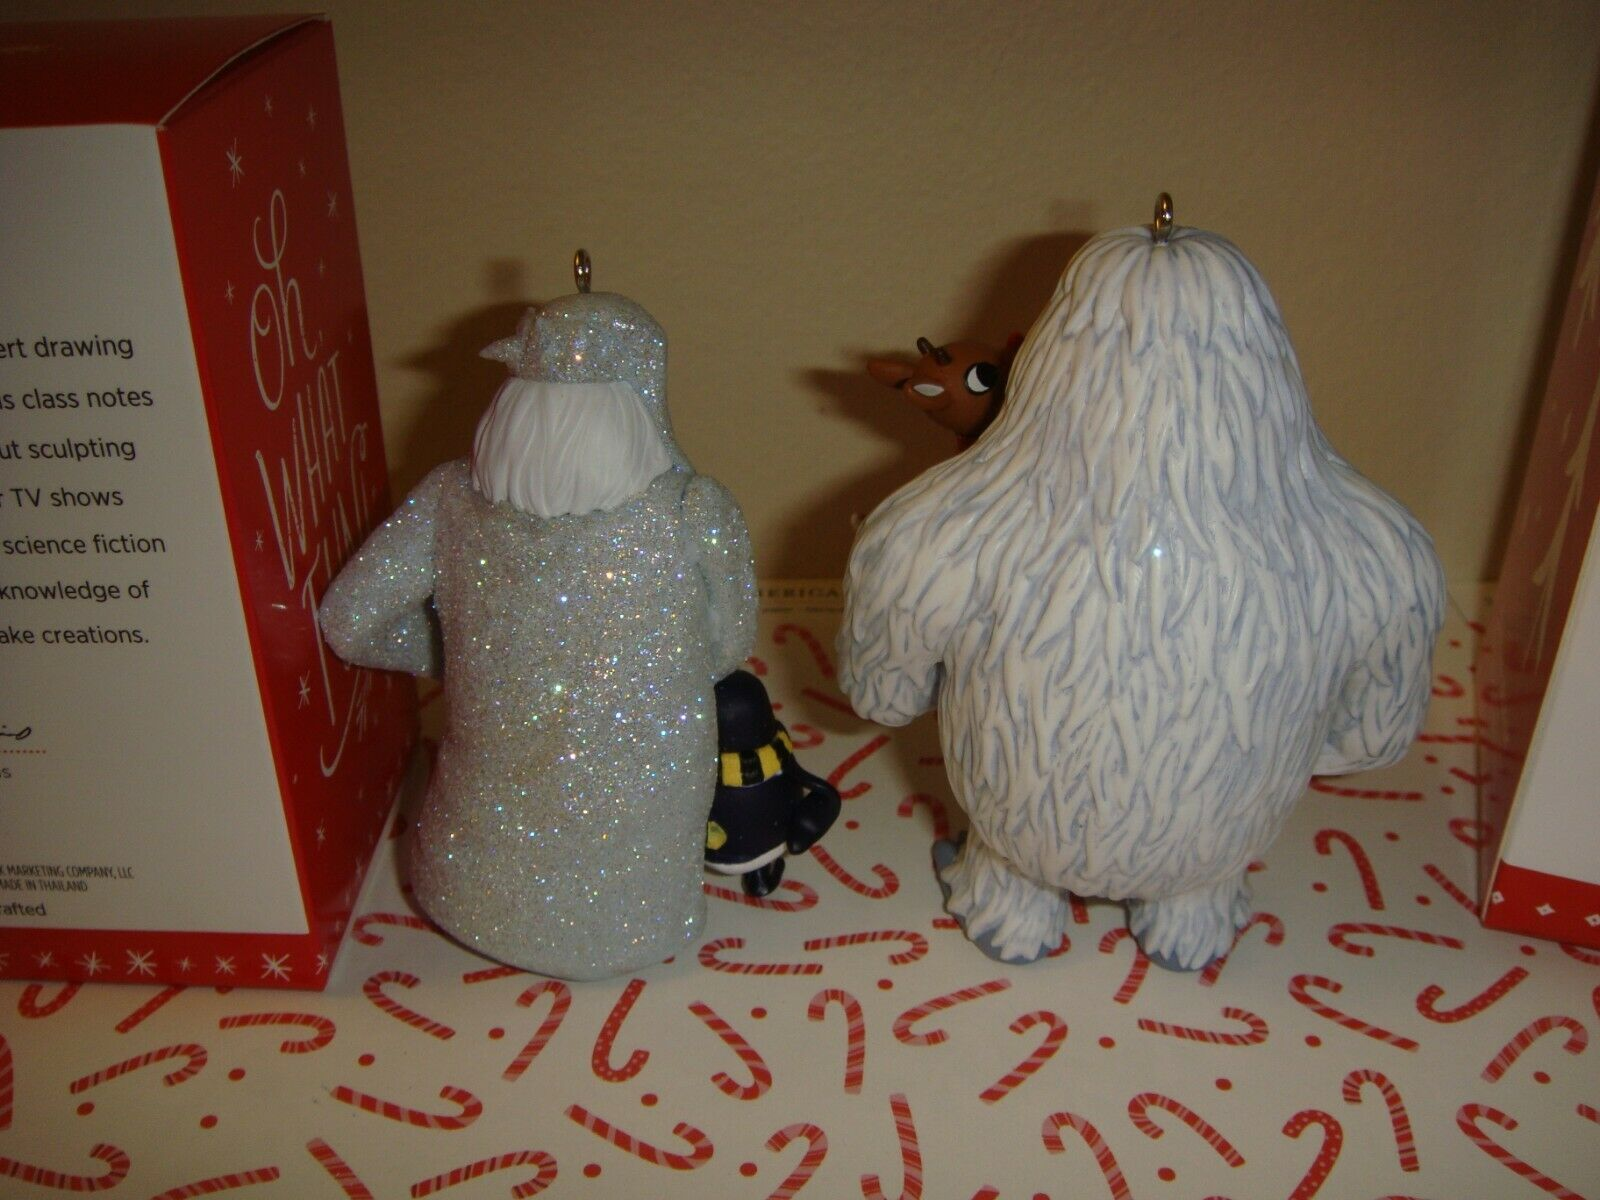 Winter Warlock 2016 Hallmark Ornament Santa Claus is Comin/' To Town Penguin Snow